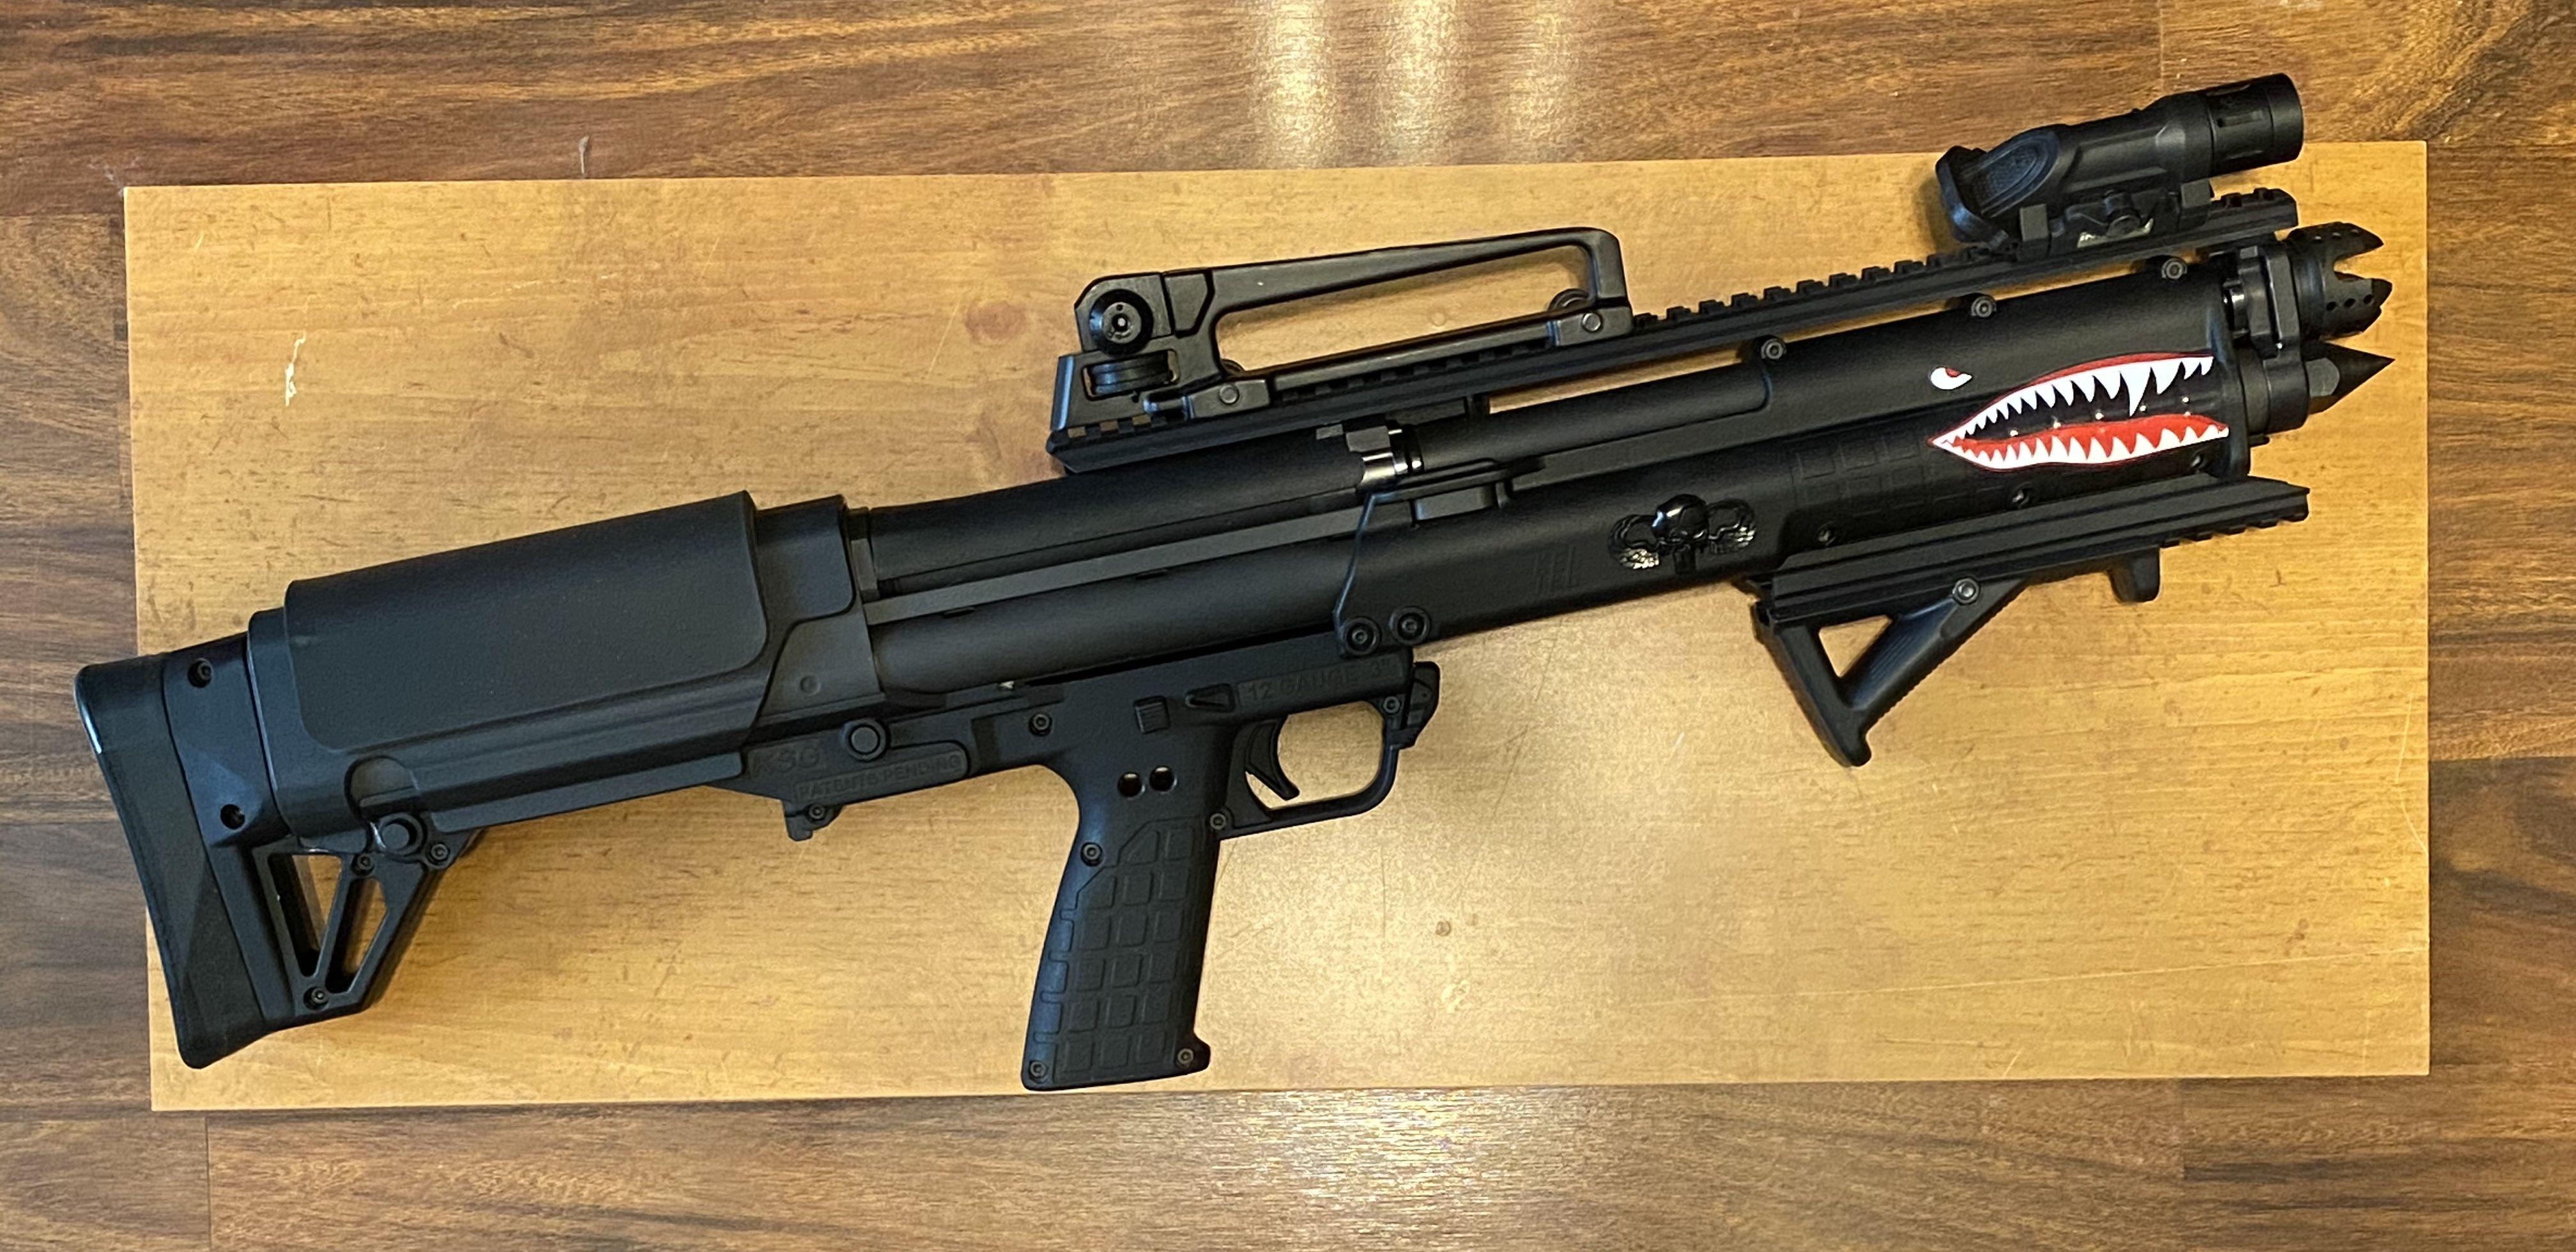 Custom KSG by Willis Gun | Guns, Shotgun